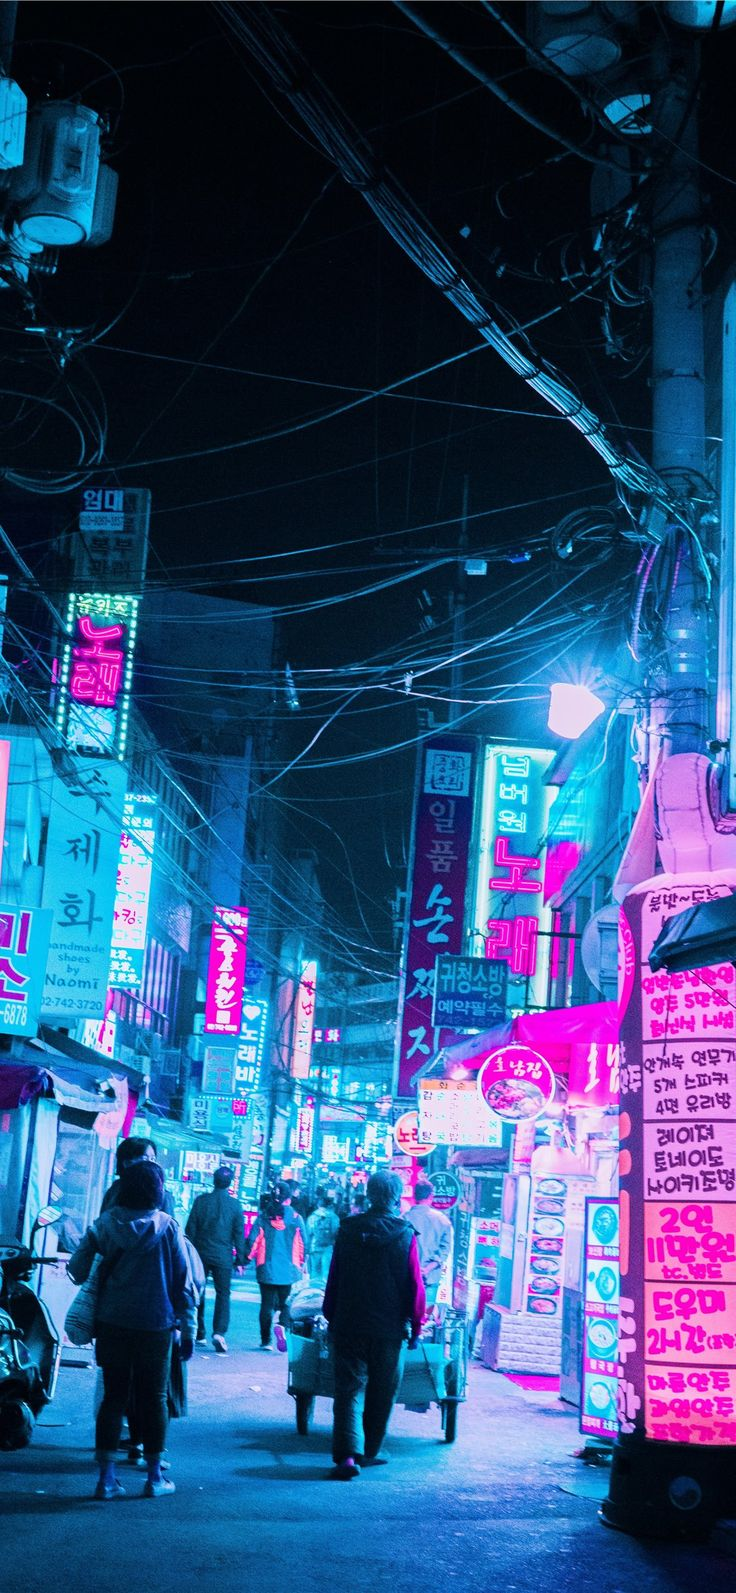 Seoul iPhone X Wallpapers Cyberpunk, Pink neon wallpaper